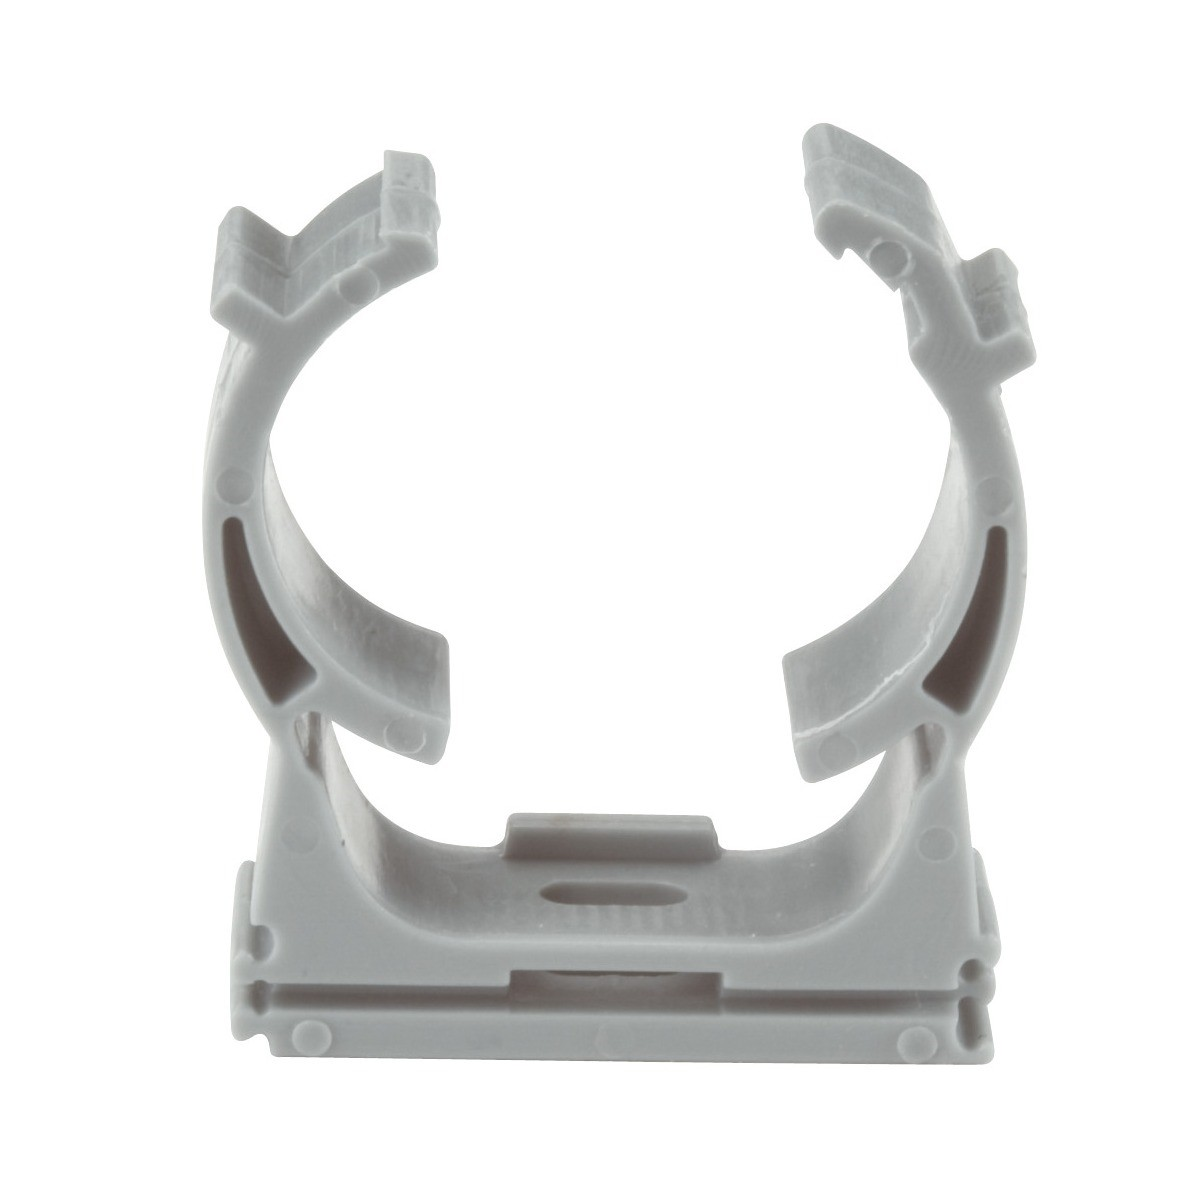 Abracadeira 1 em PVC Cinza - Tramontina